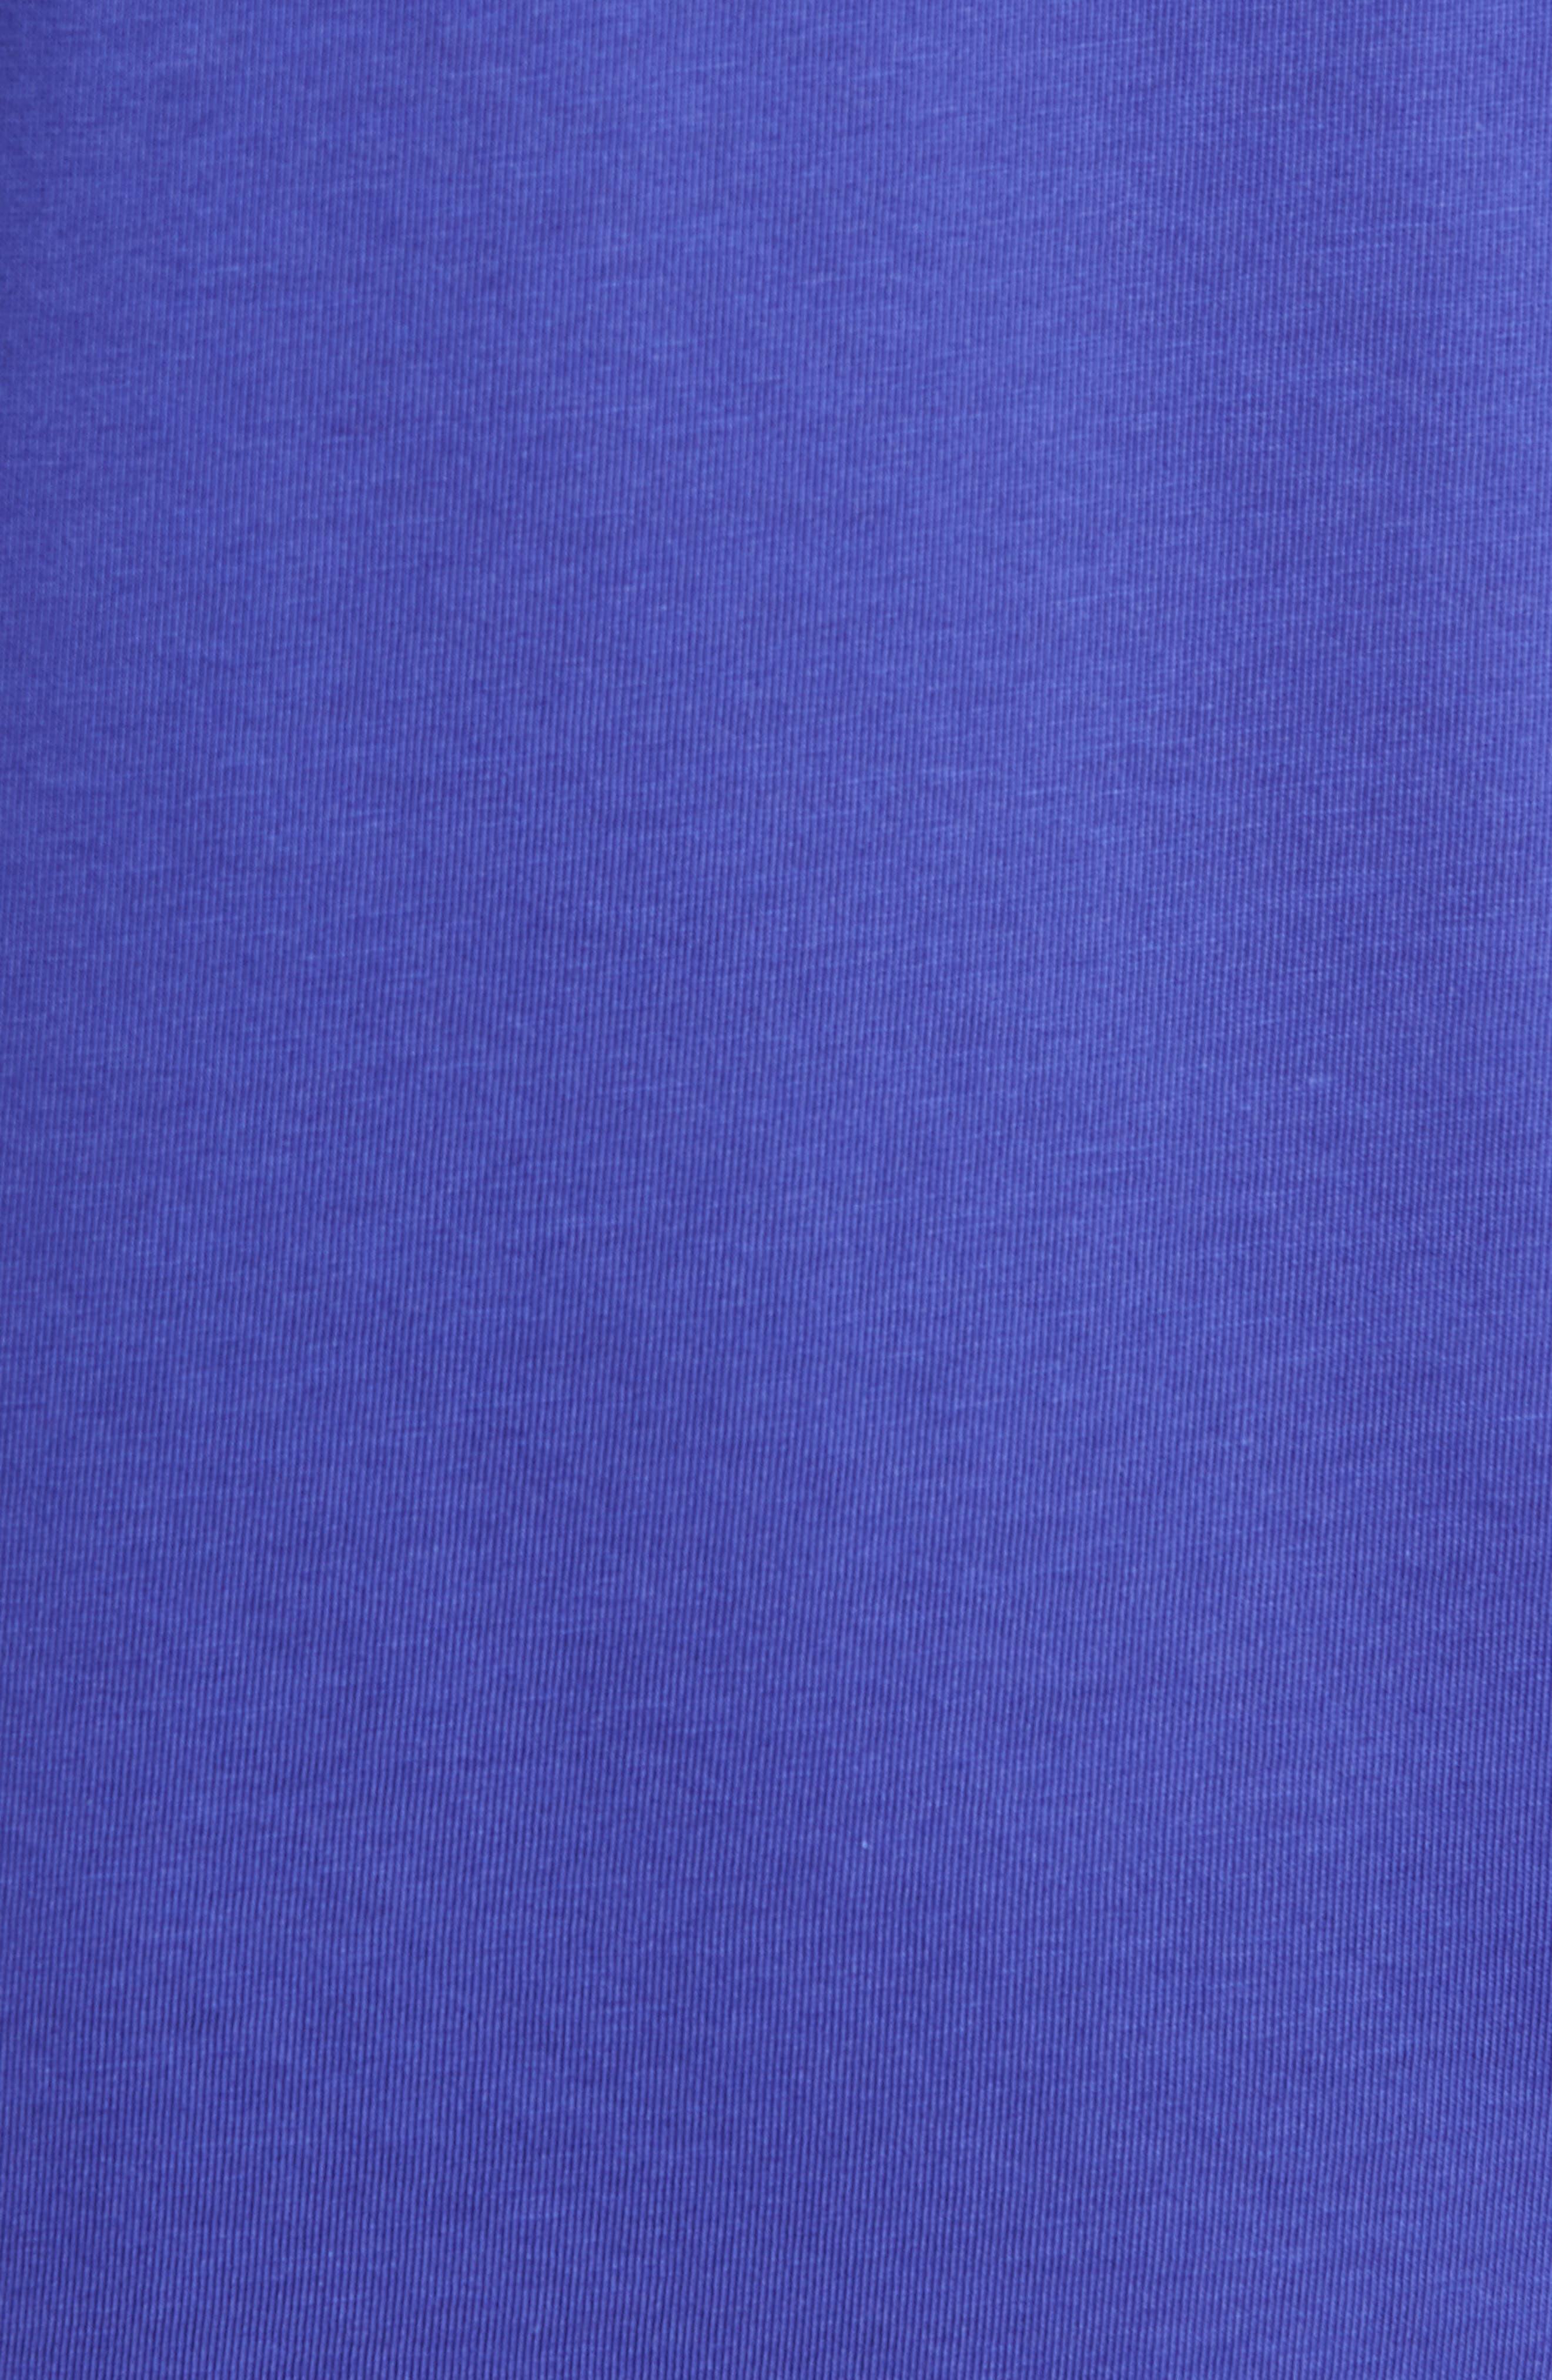 Basketball T-Shirt,                             Alternate thumbnail 5, color,                             BLUE